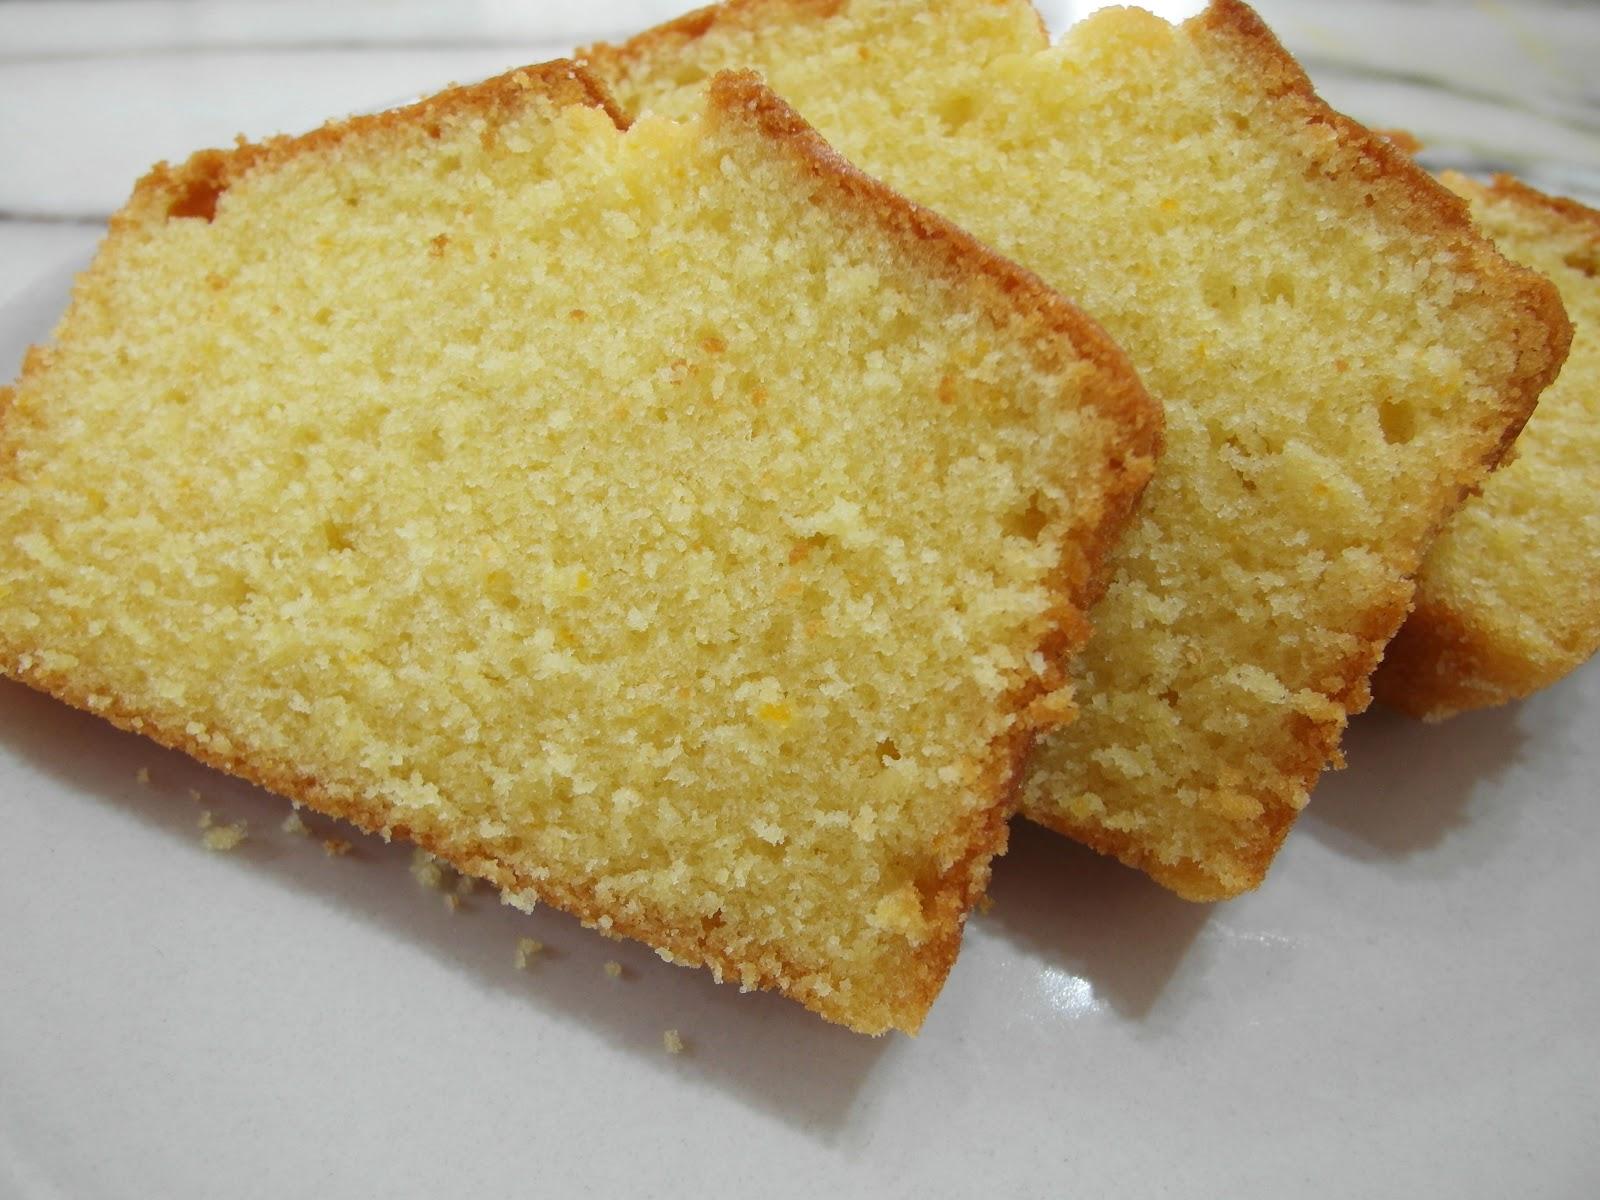 Baking Library: Back to Basics - Orange Butter Cake